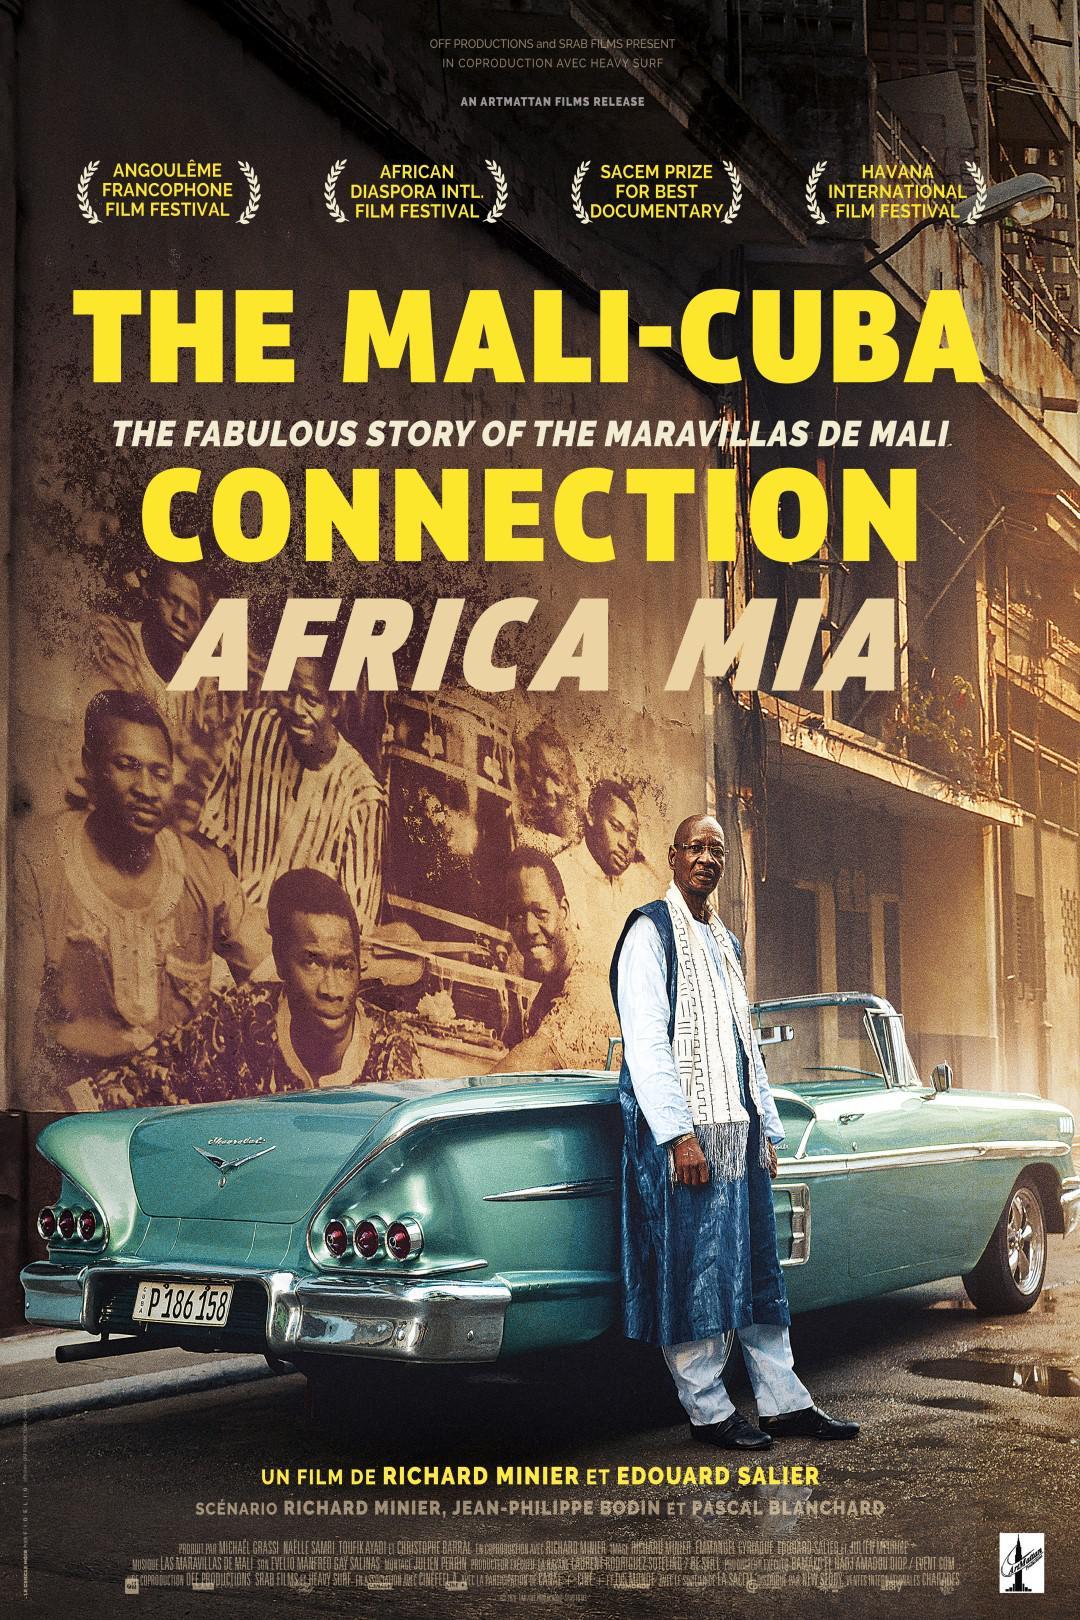 The Mali-Cuba Connection/Africa Mia